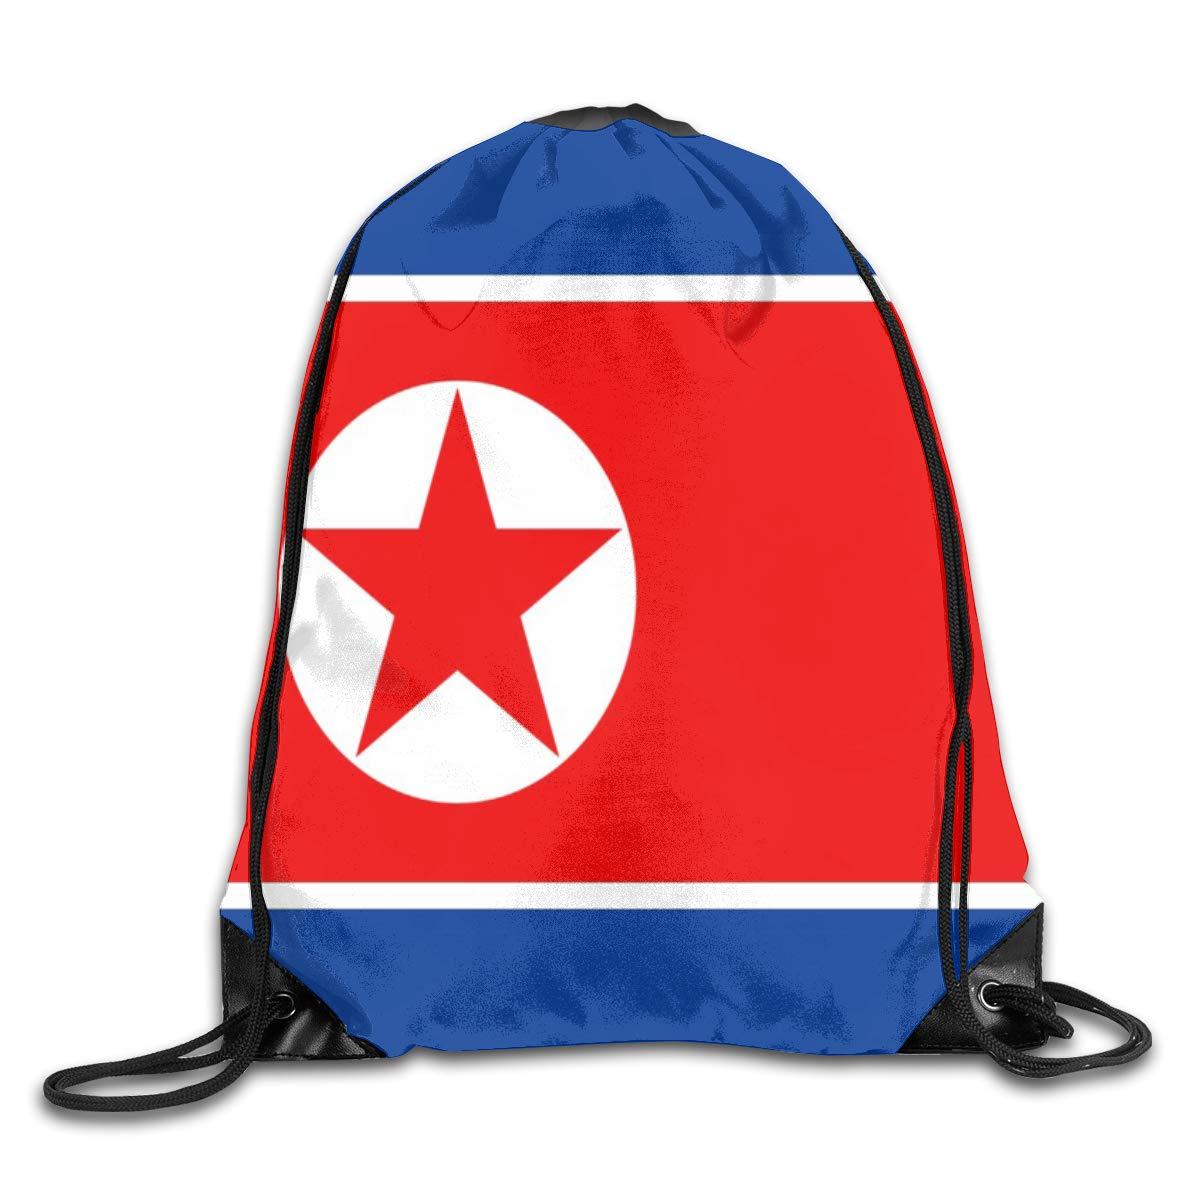 Flag Of North Korea Beam Mouth Backpack Pull Rope Shoulder Bag Outdoor Sports Leisure Bag